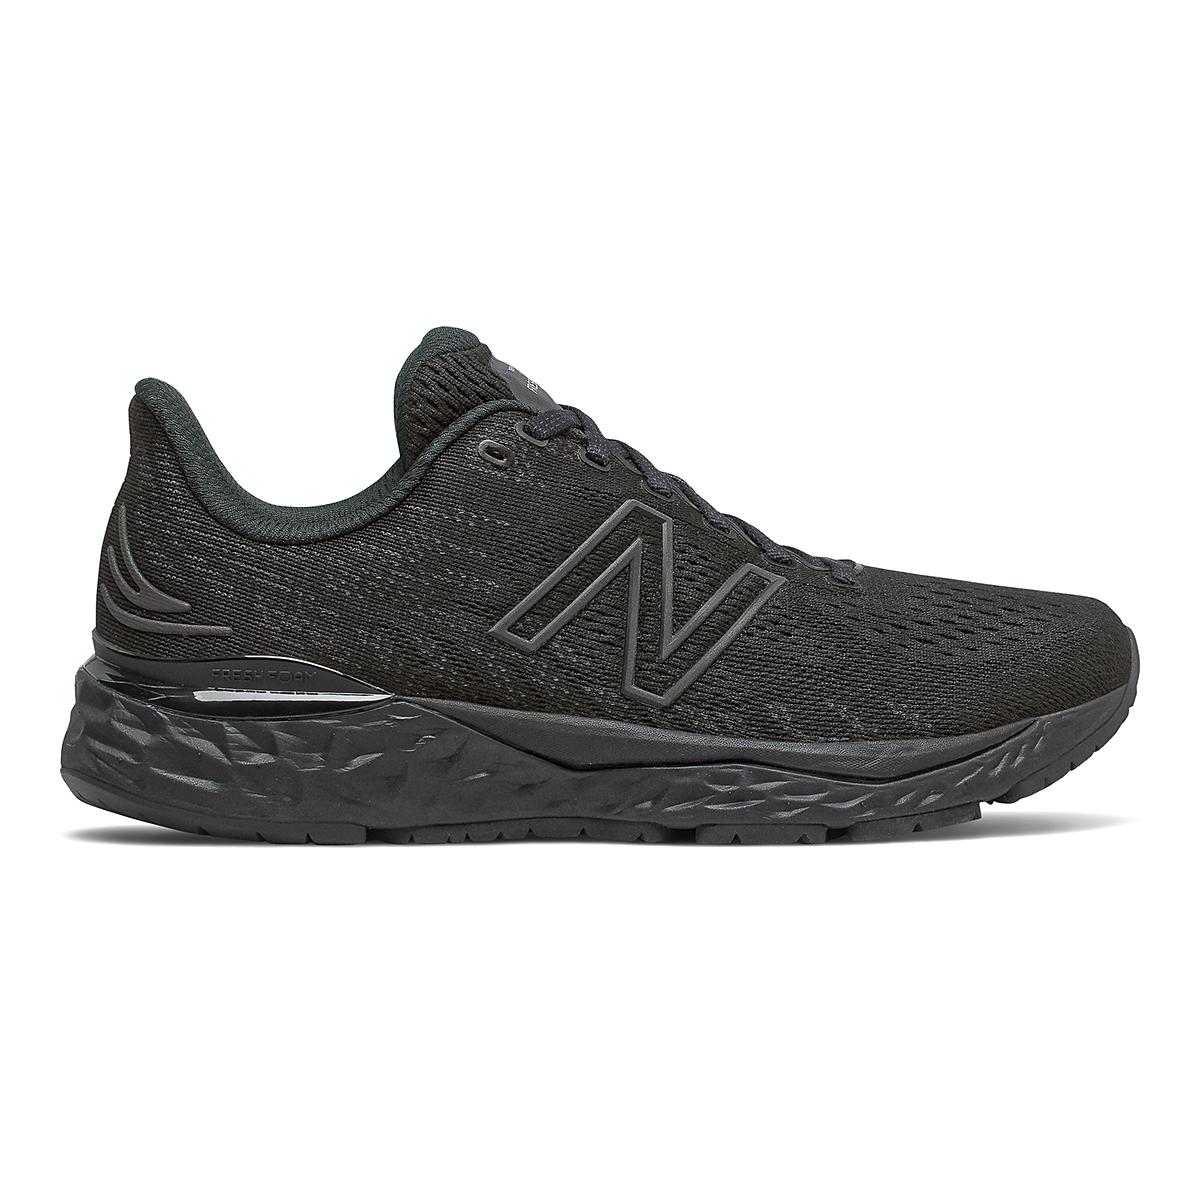 Women's New Balance 880V11 Running Shoe - Color: Black/Phantom - Size: 5 - Width: Narrow, Black/Phantom, large, image 1